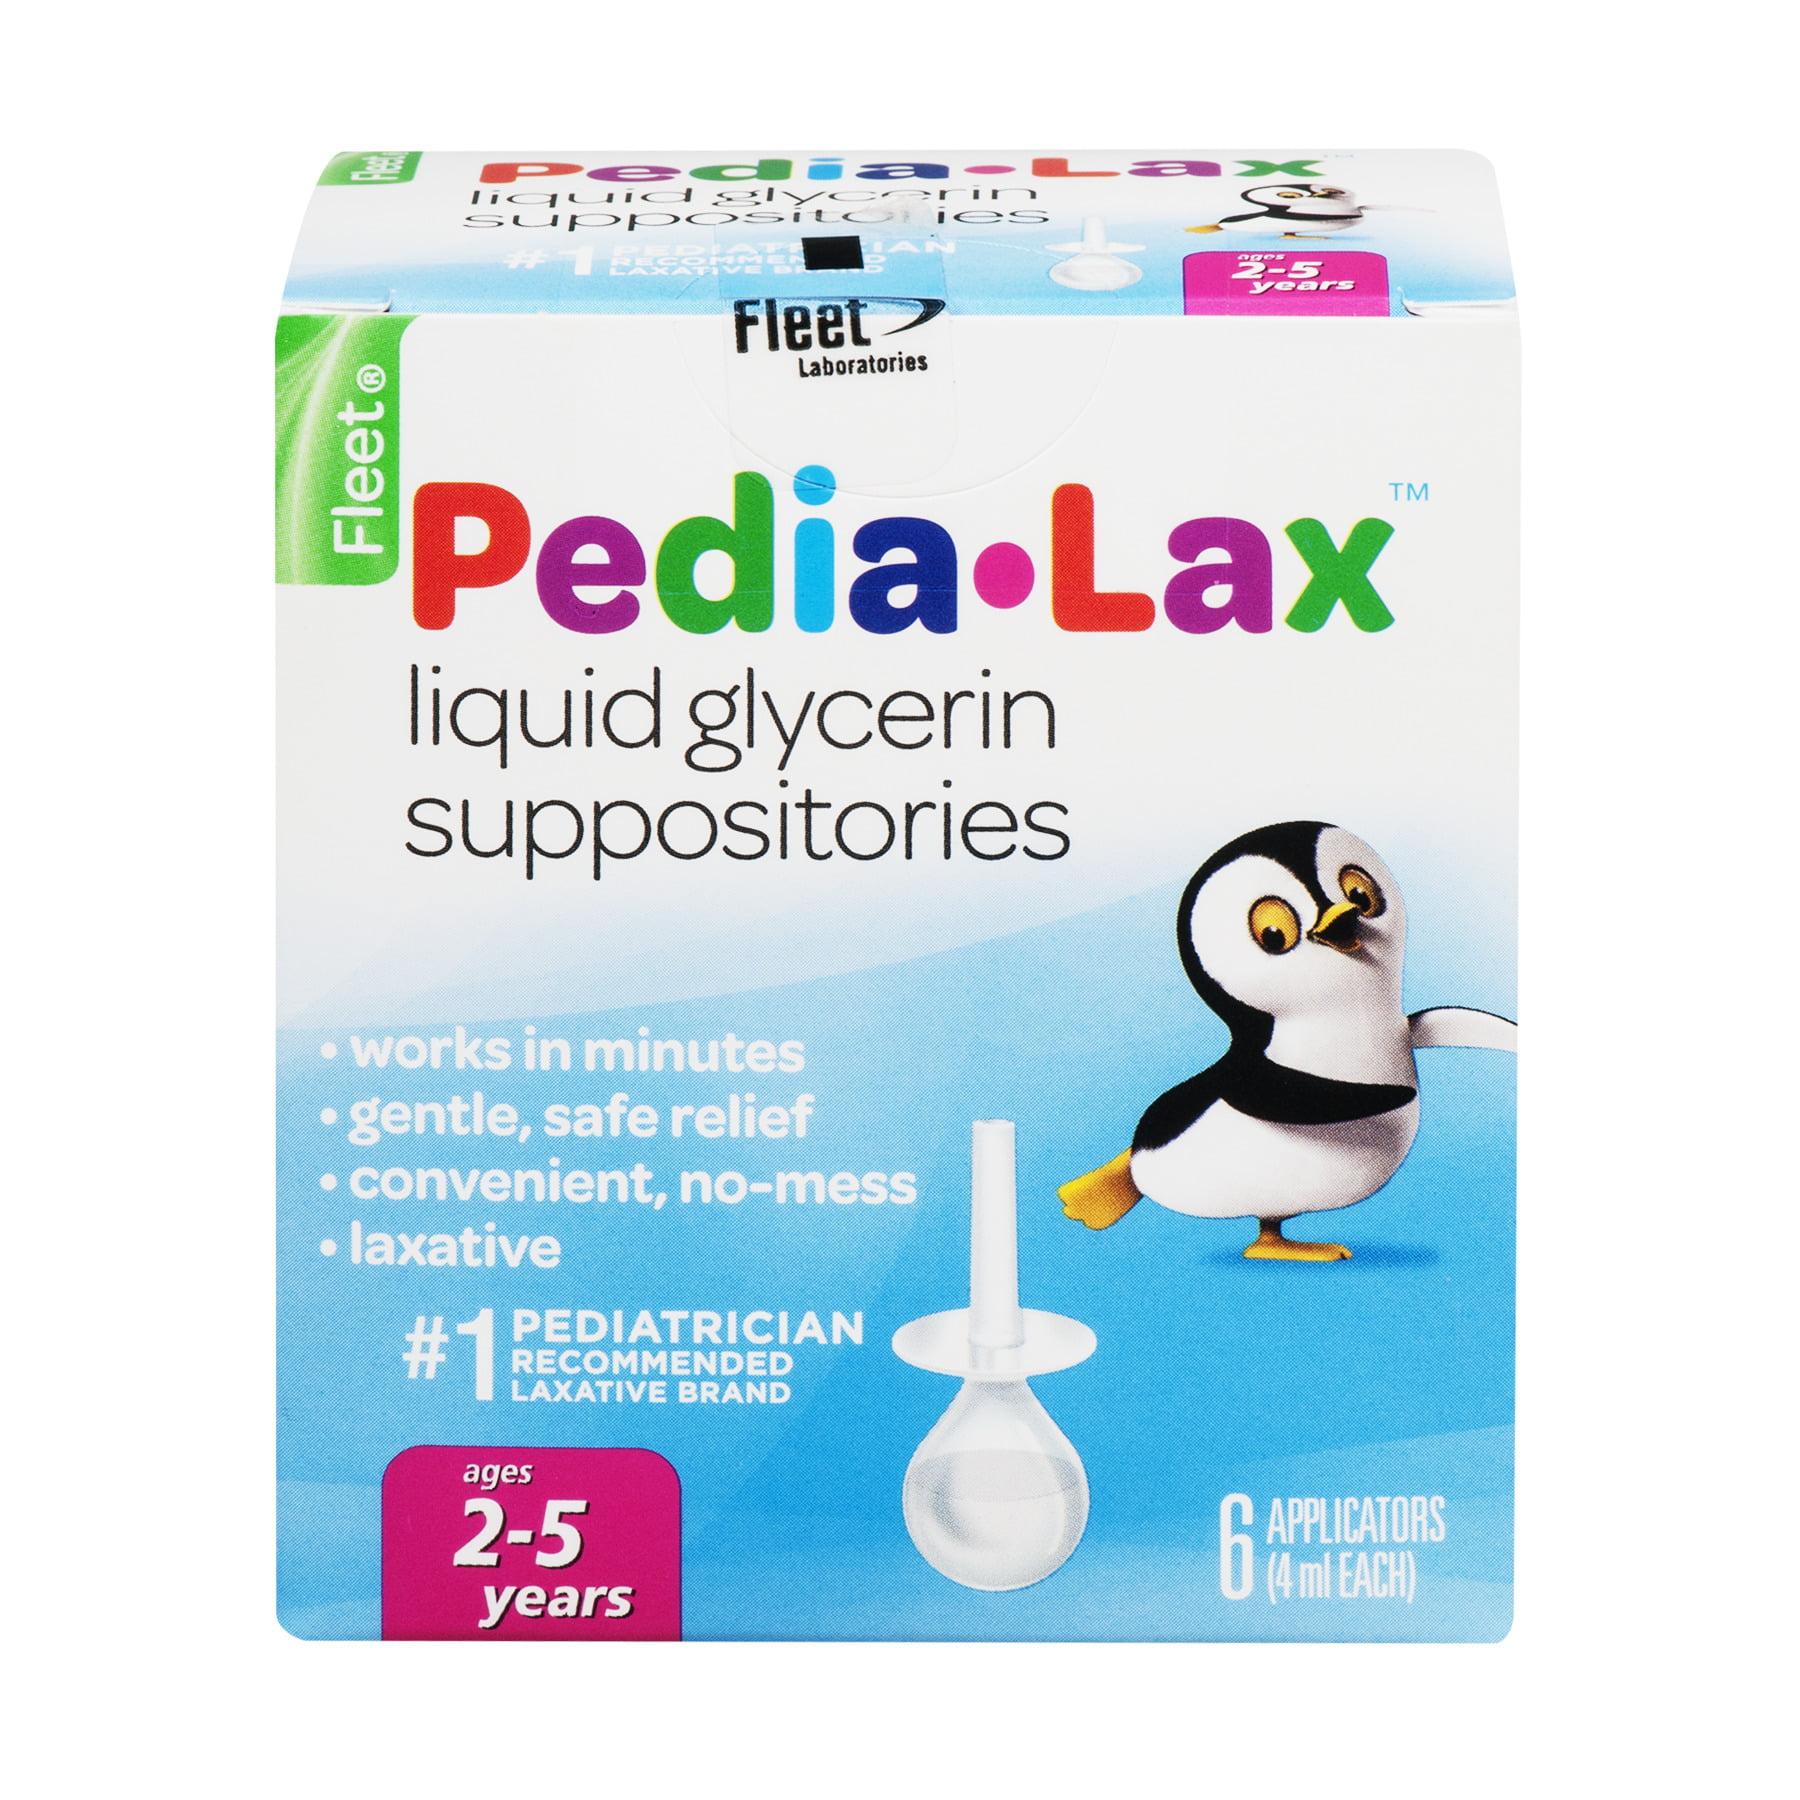 Fleet Pedia-Lax Liquid Glycerin Suppositories, 6 count